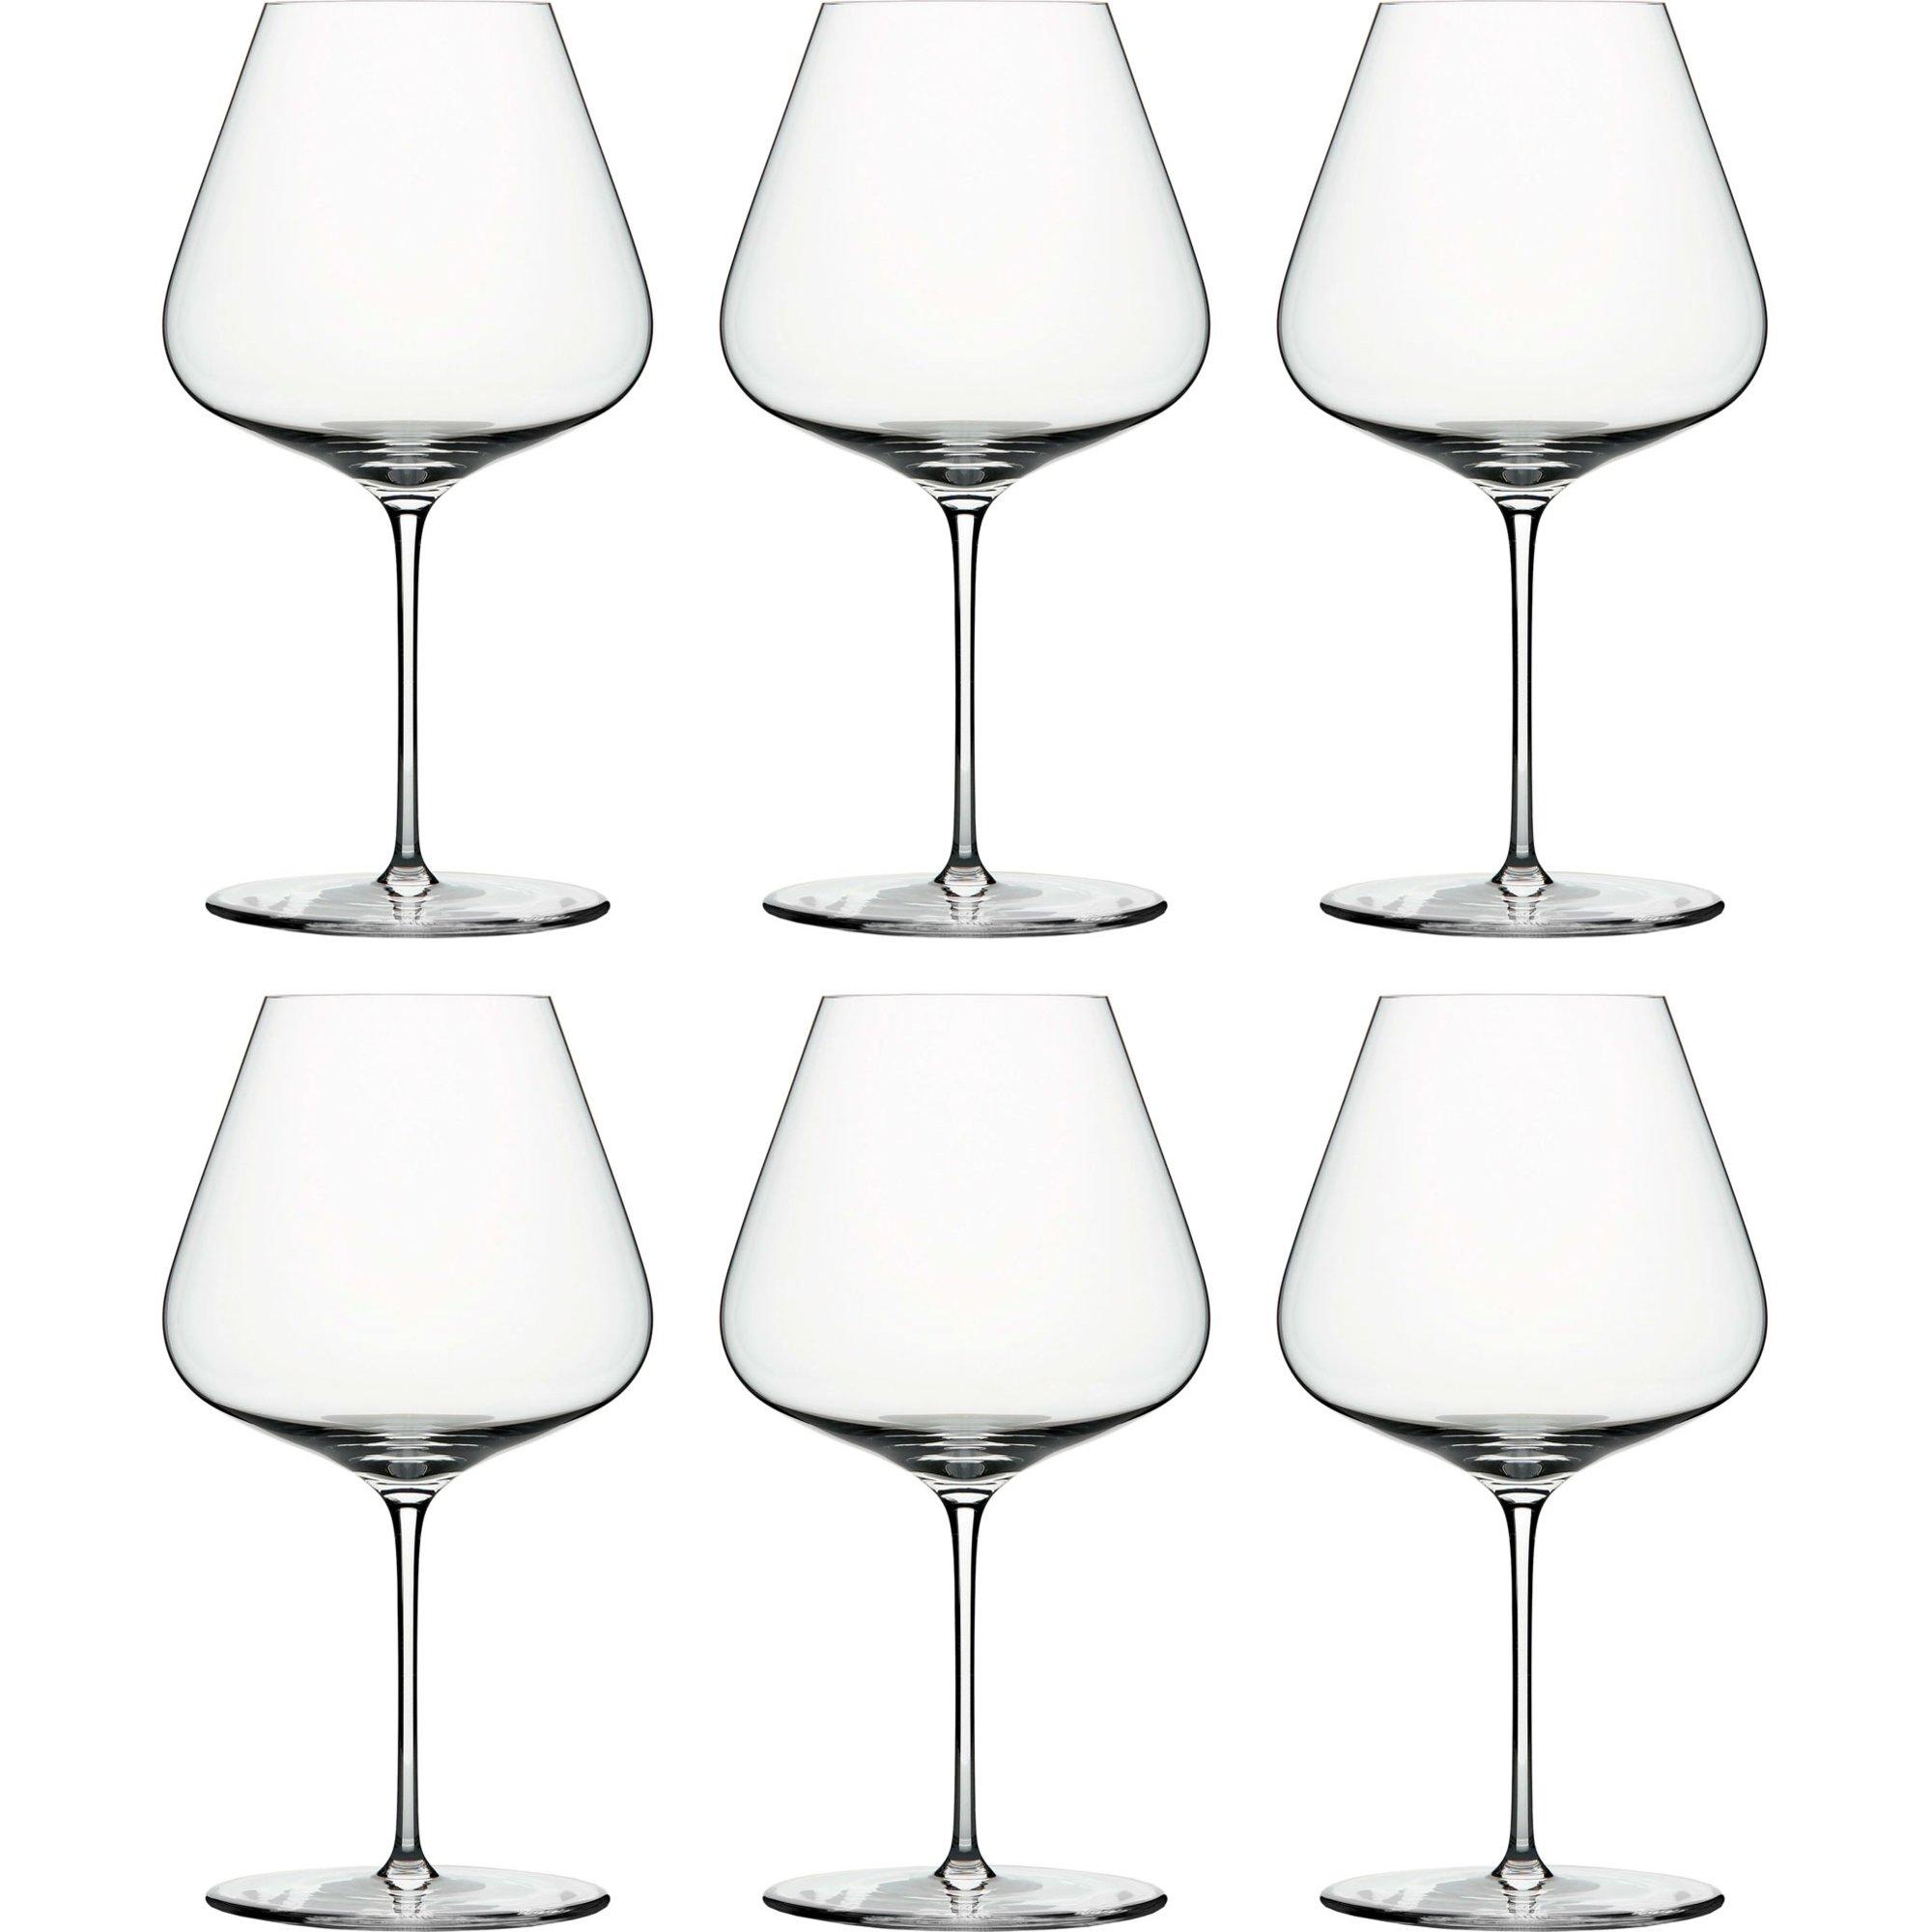 Zalto Bourgogne vinglas 960 ml. 6 st.